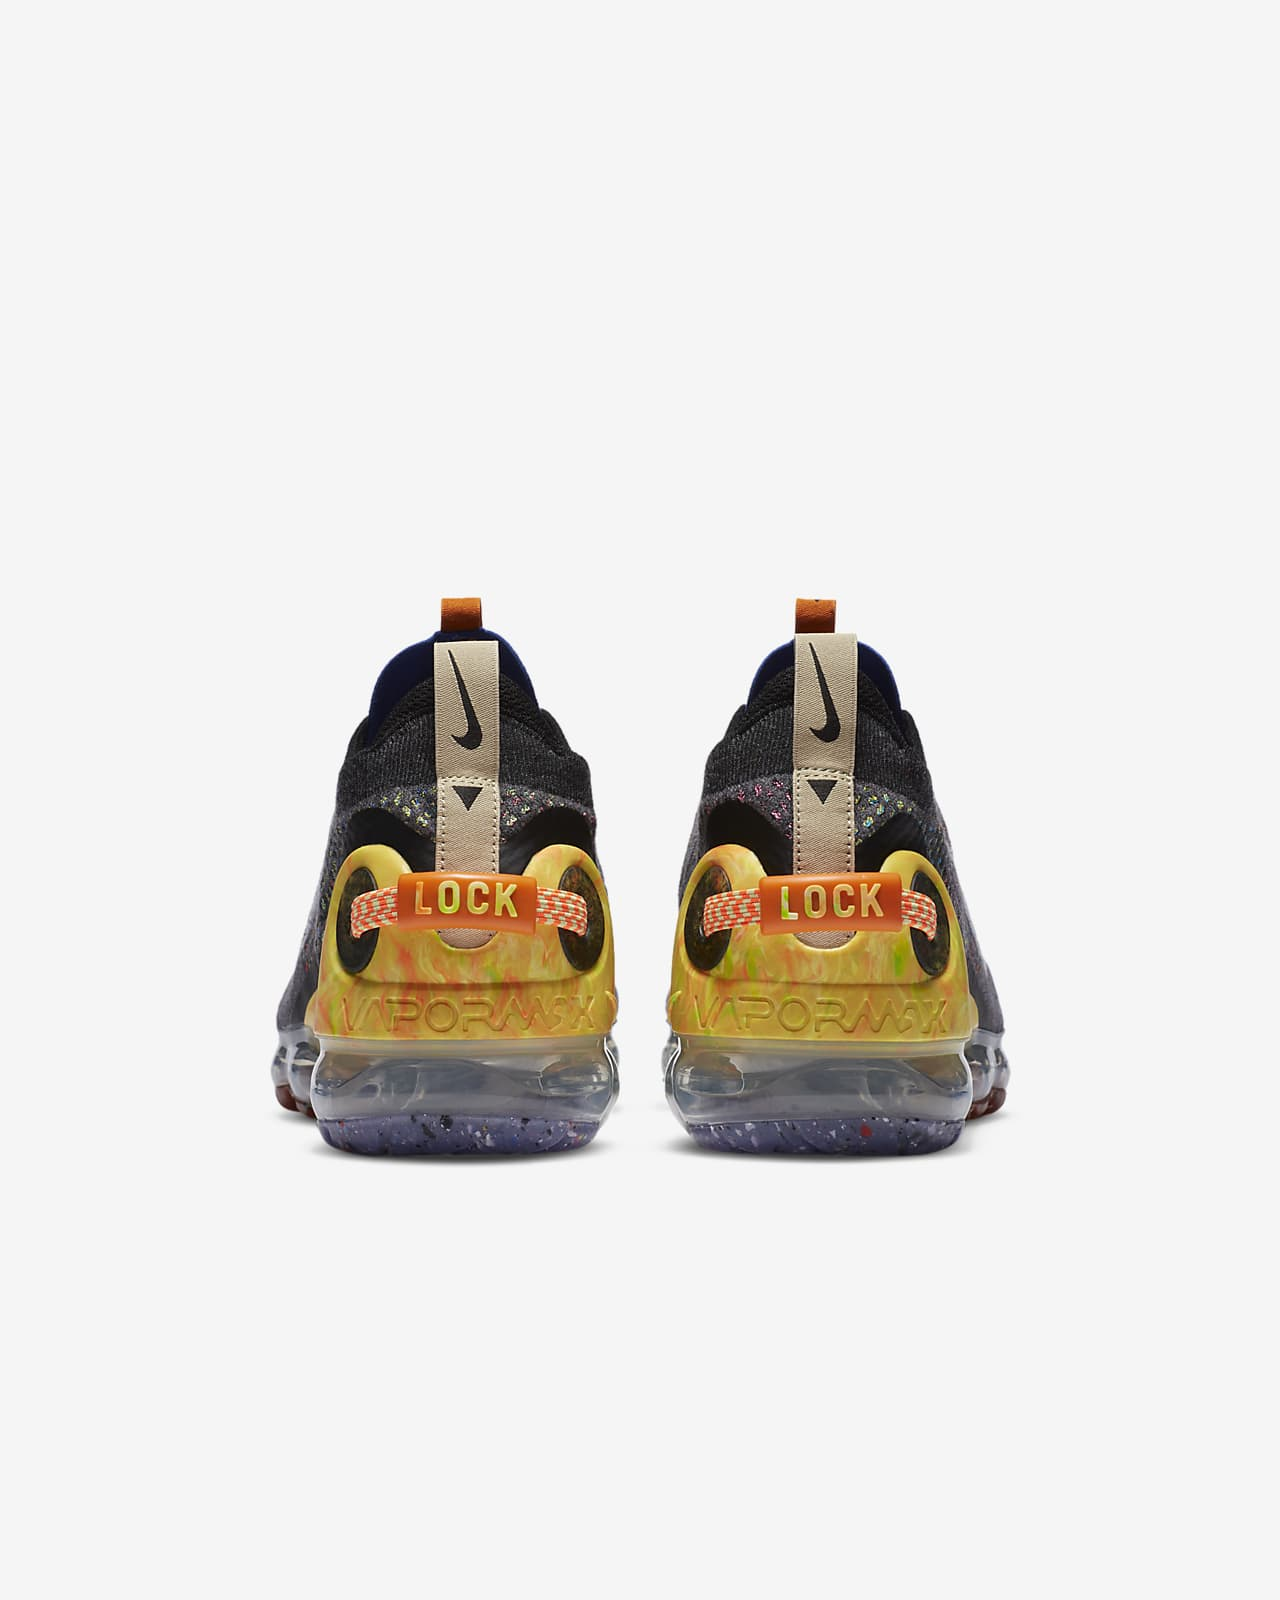 Nike womens AIR vapormax FK MOC 2 in 2020 Shoe laces